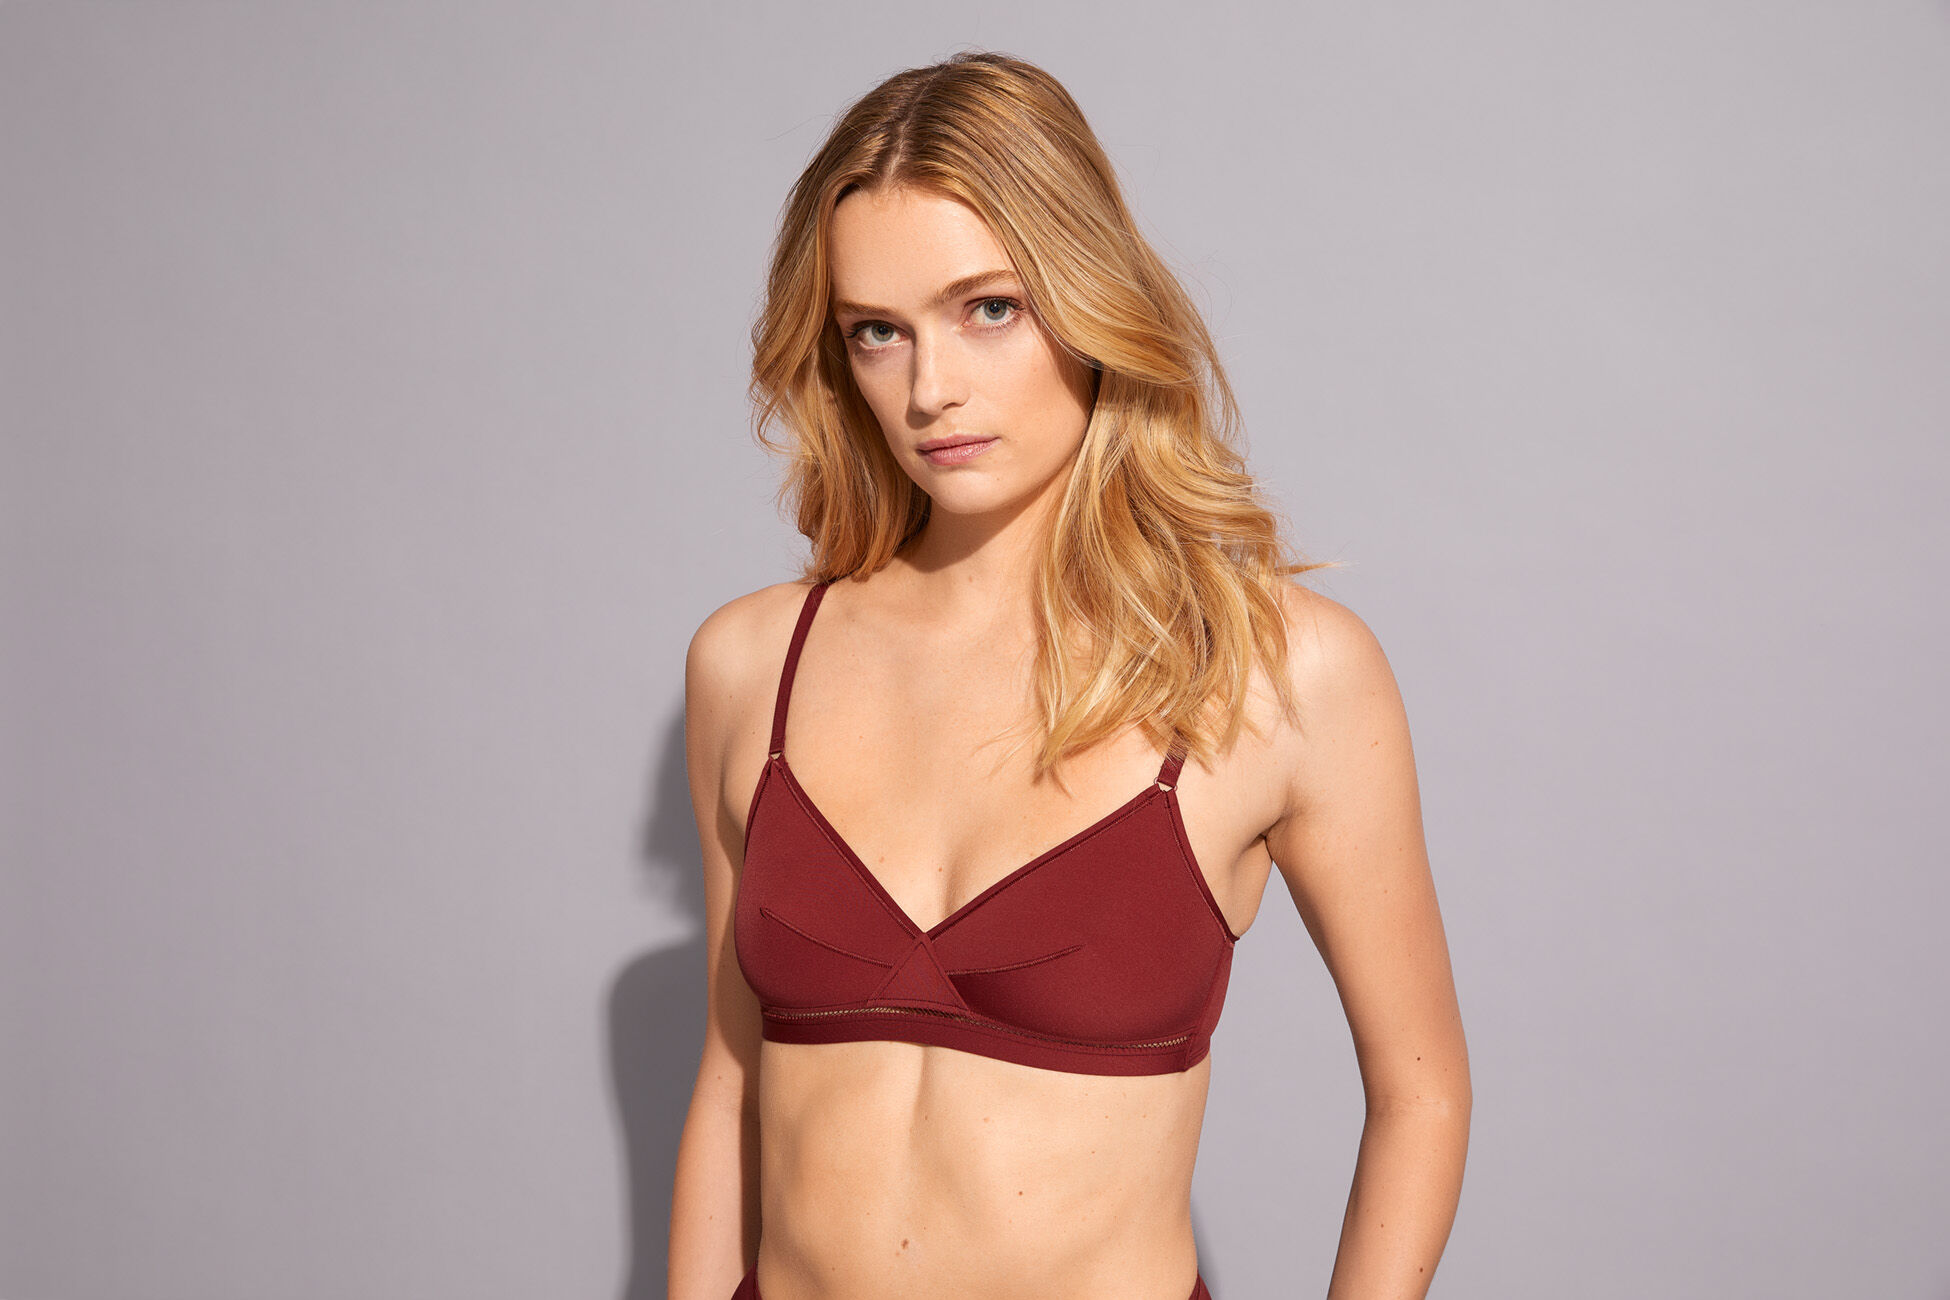 Lydia Triangle bra standard view �